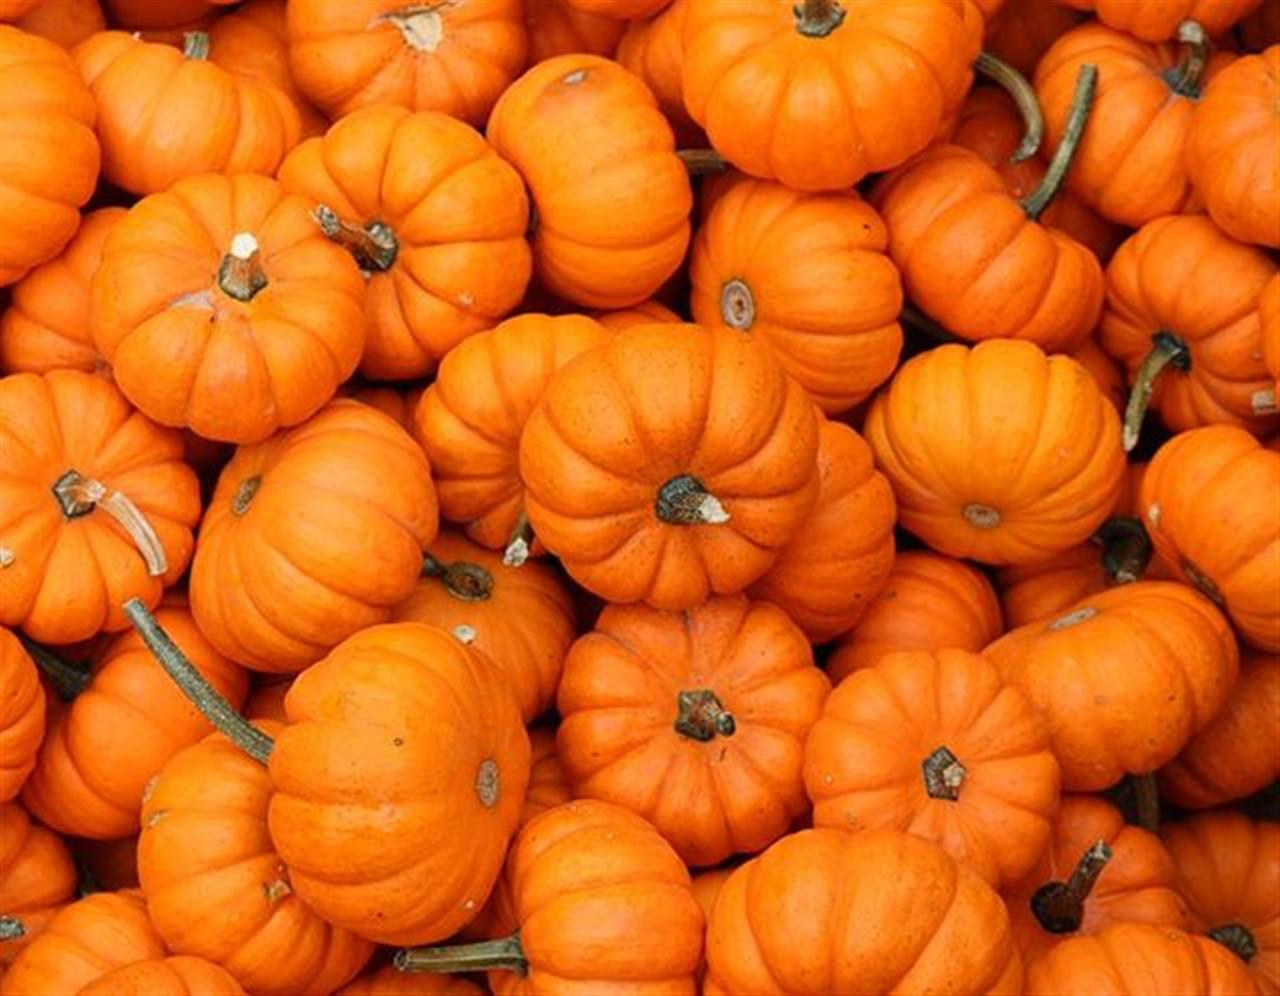 #pumpkins #stuartsapplefarm #upstateny